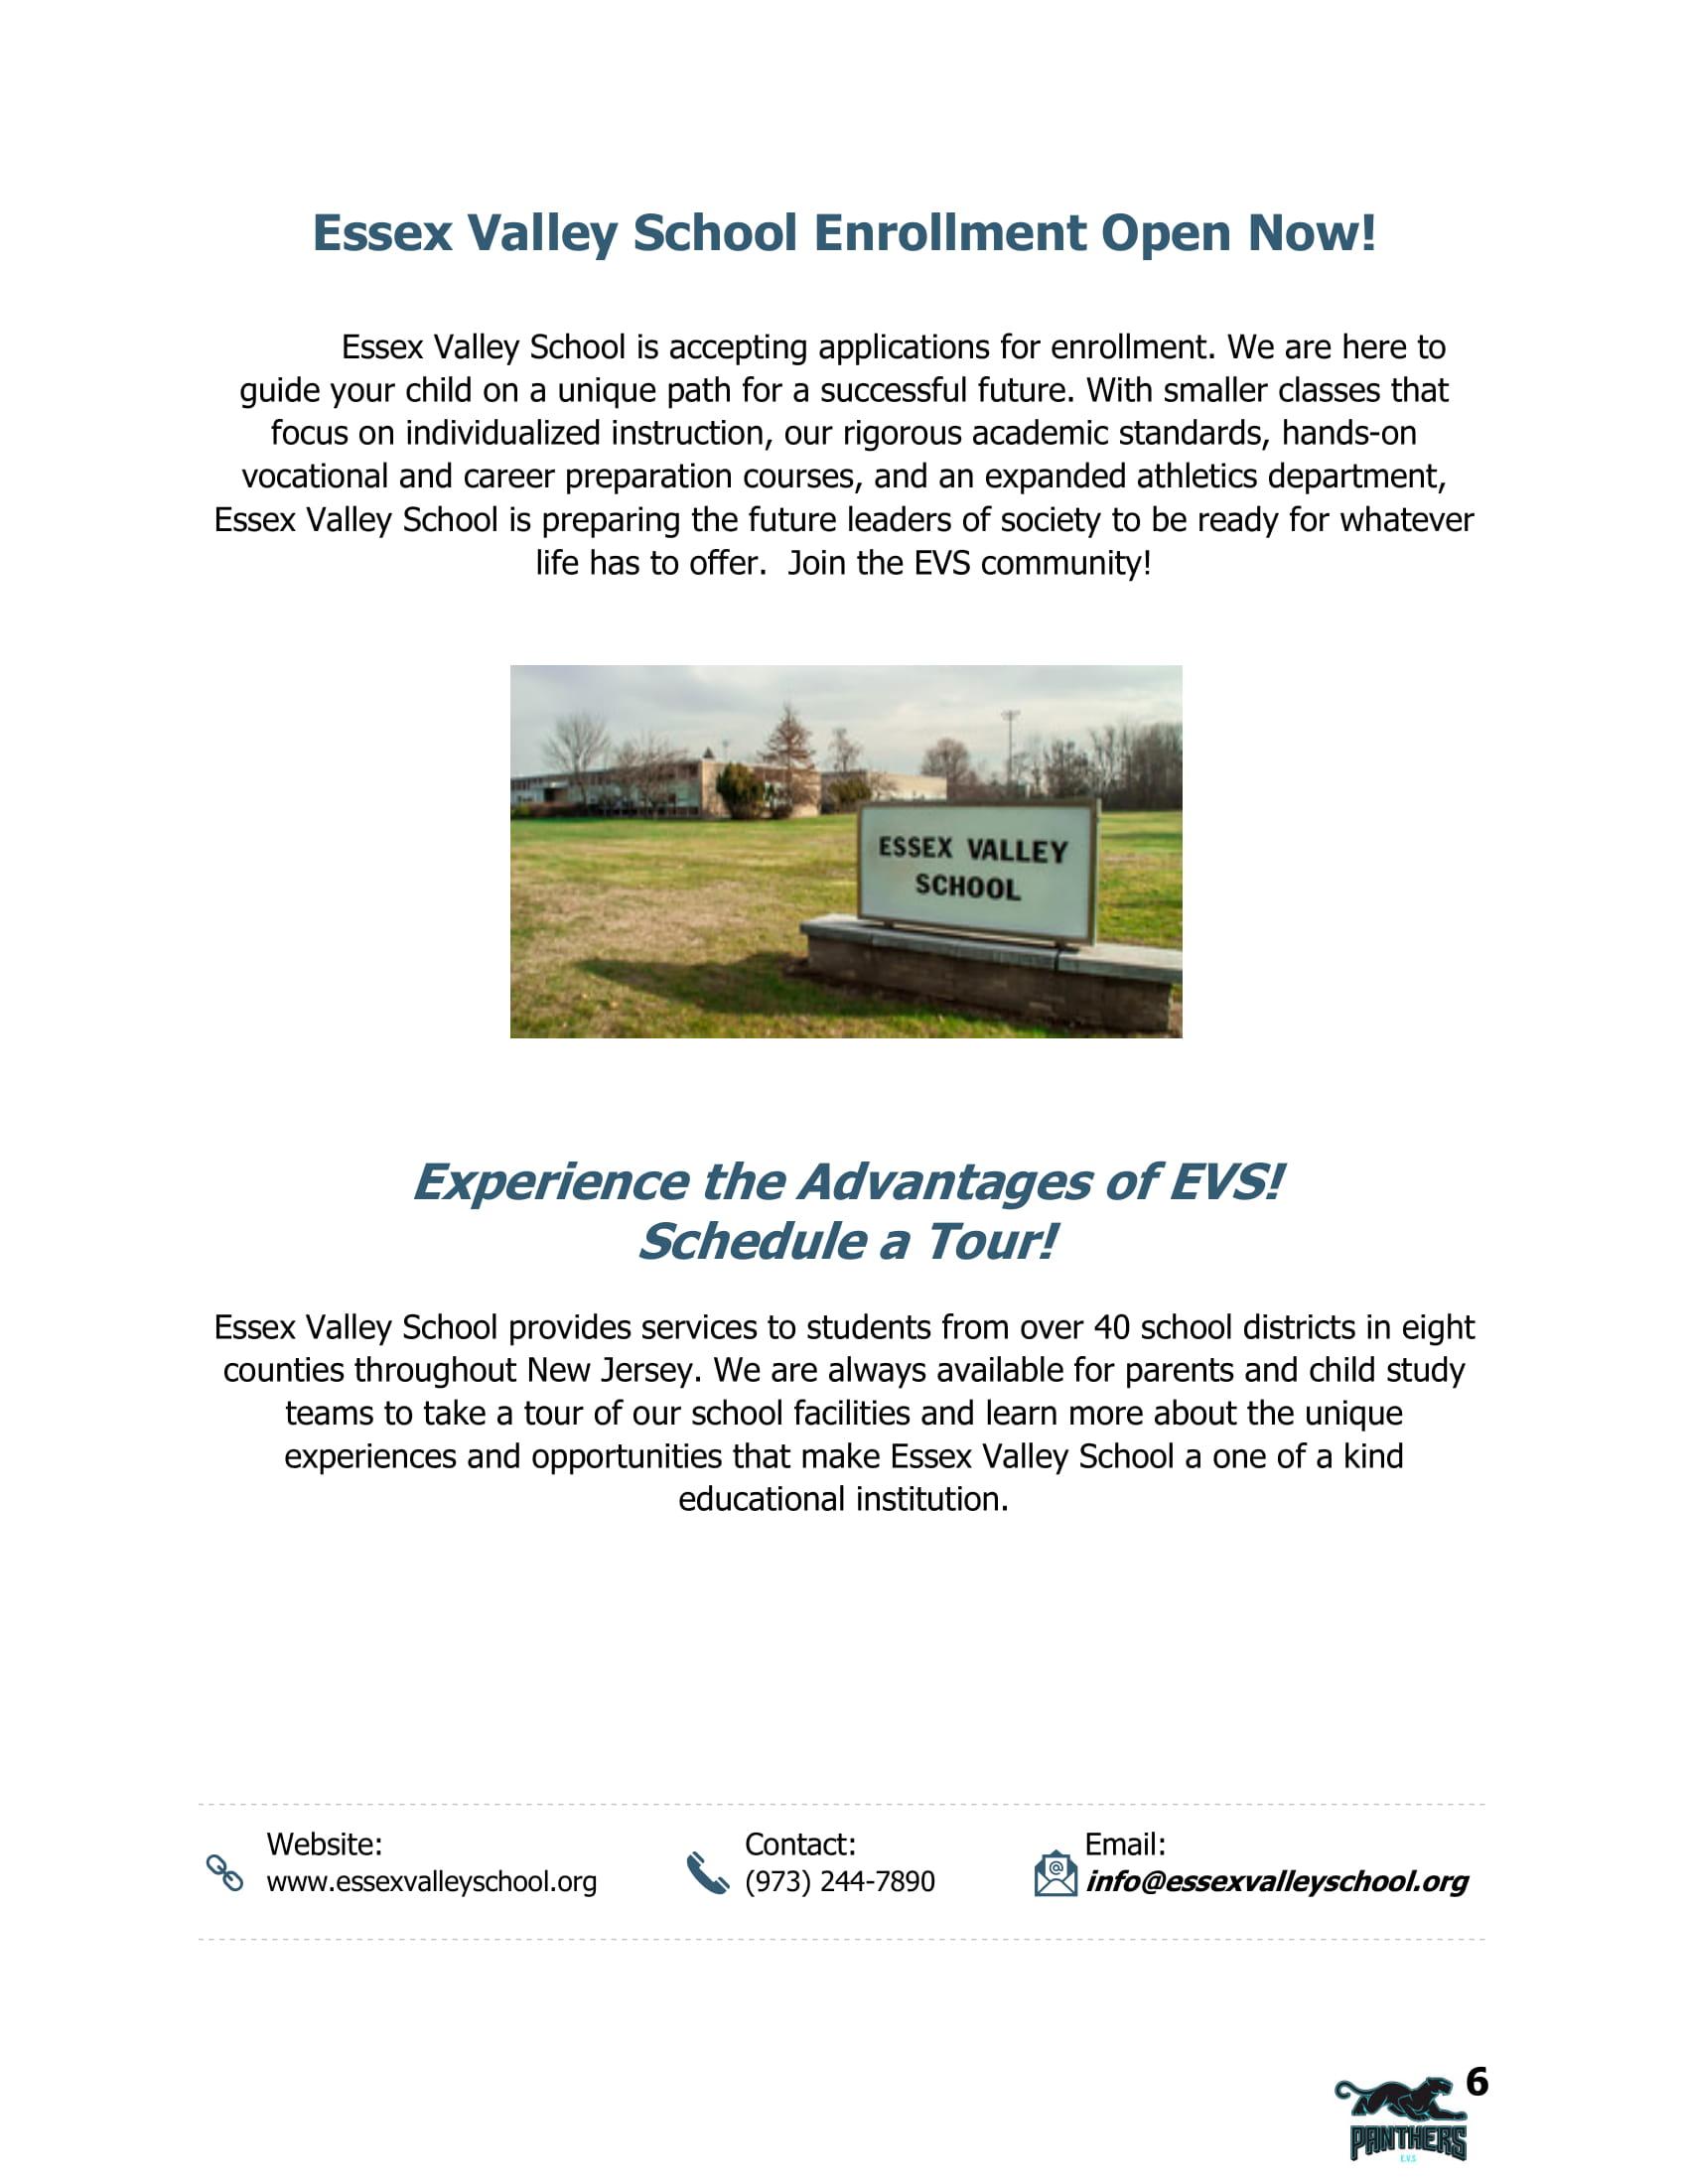 ESSEX VALLEY SCHOOL-6.jpg